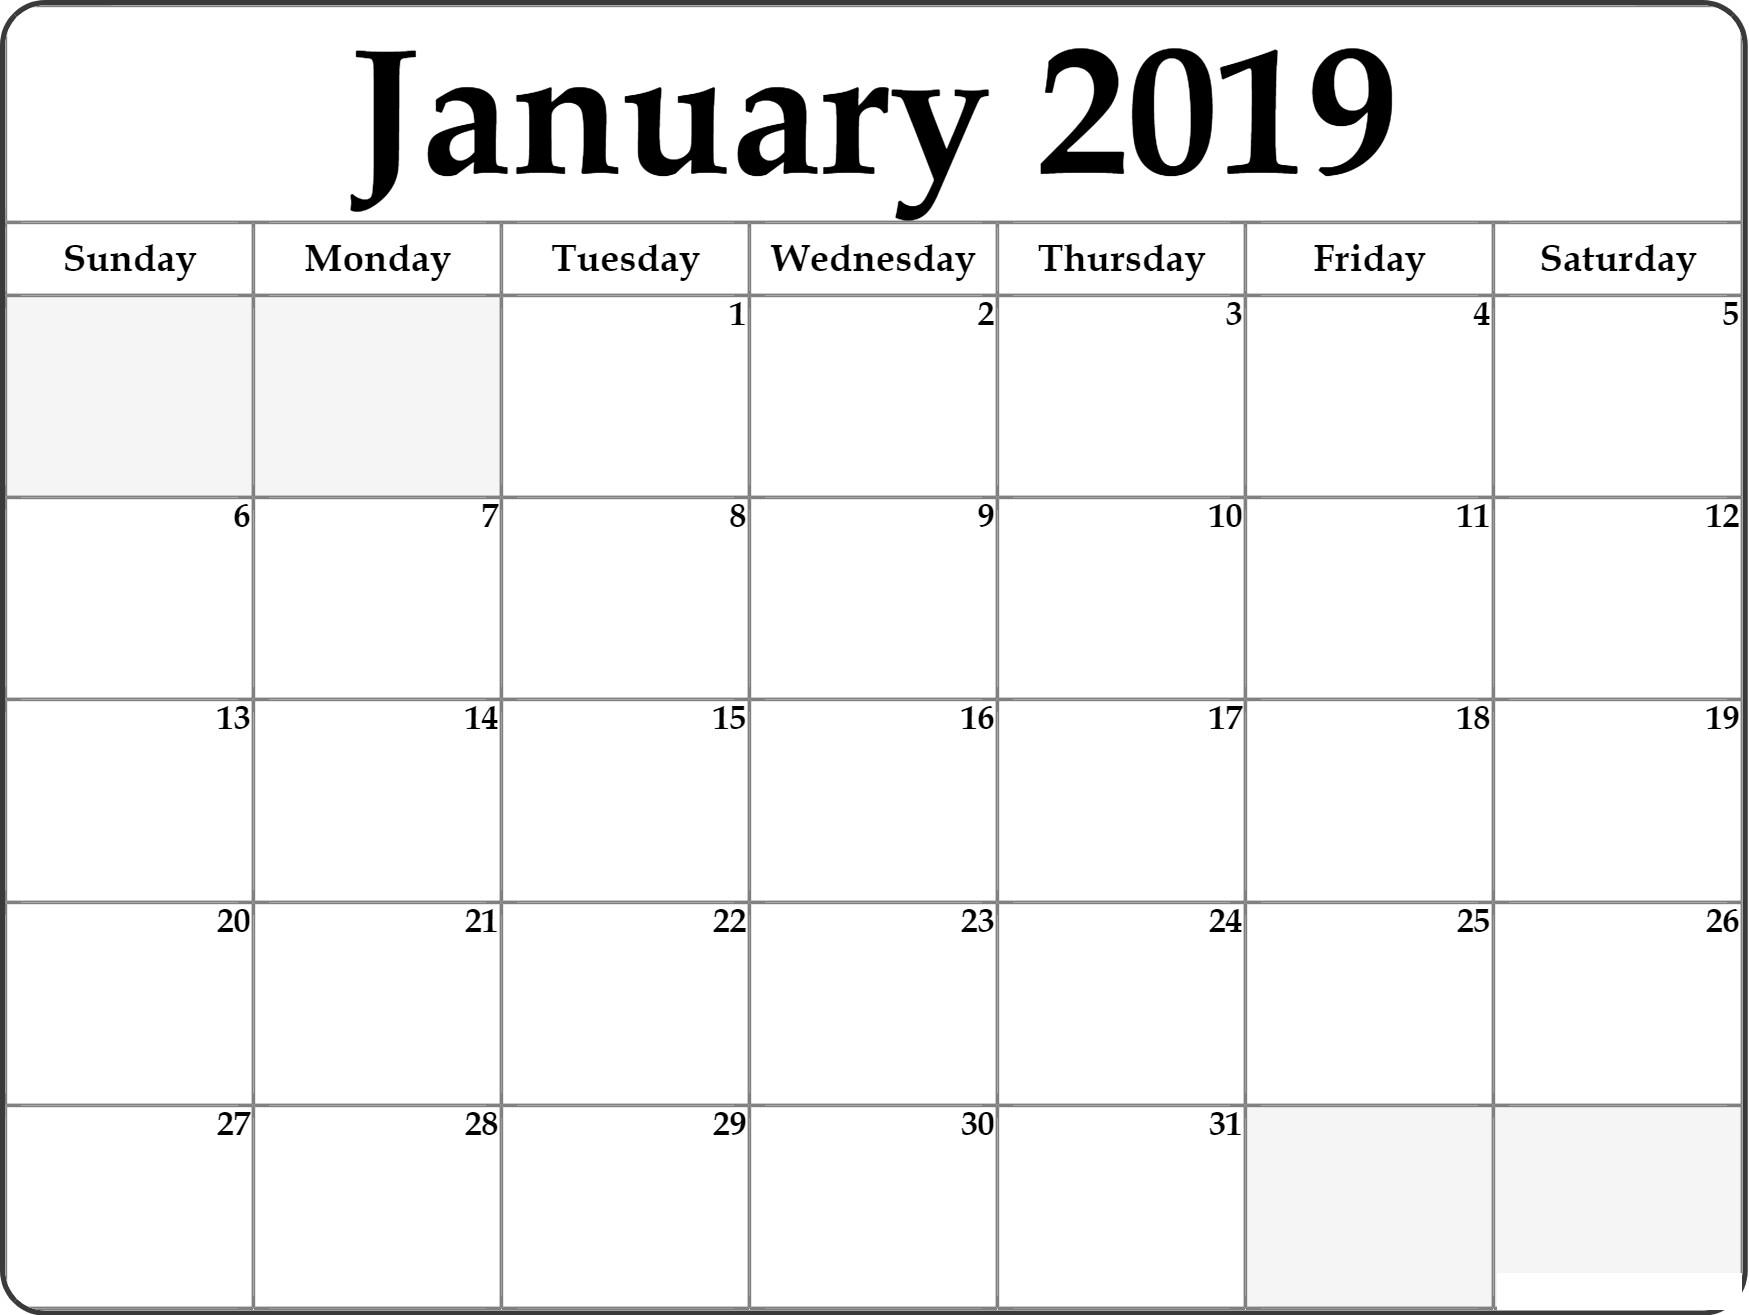 Free January 2019 Calendar Template Reminder